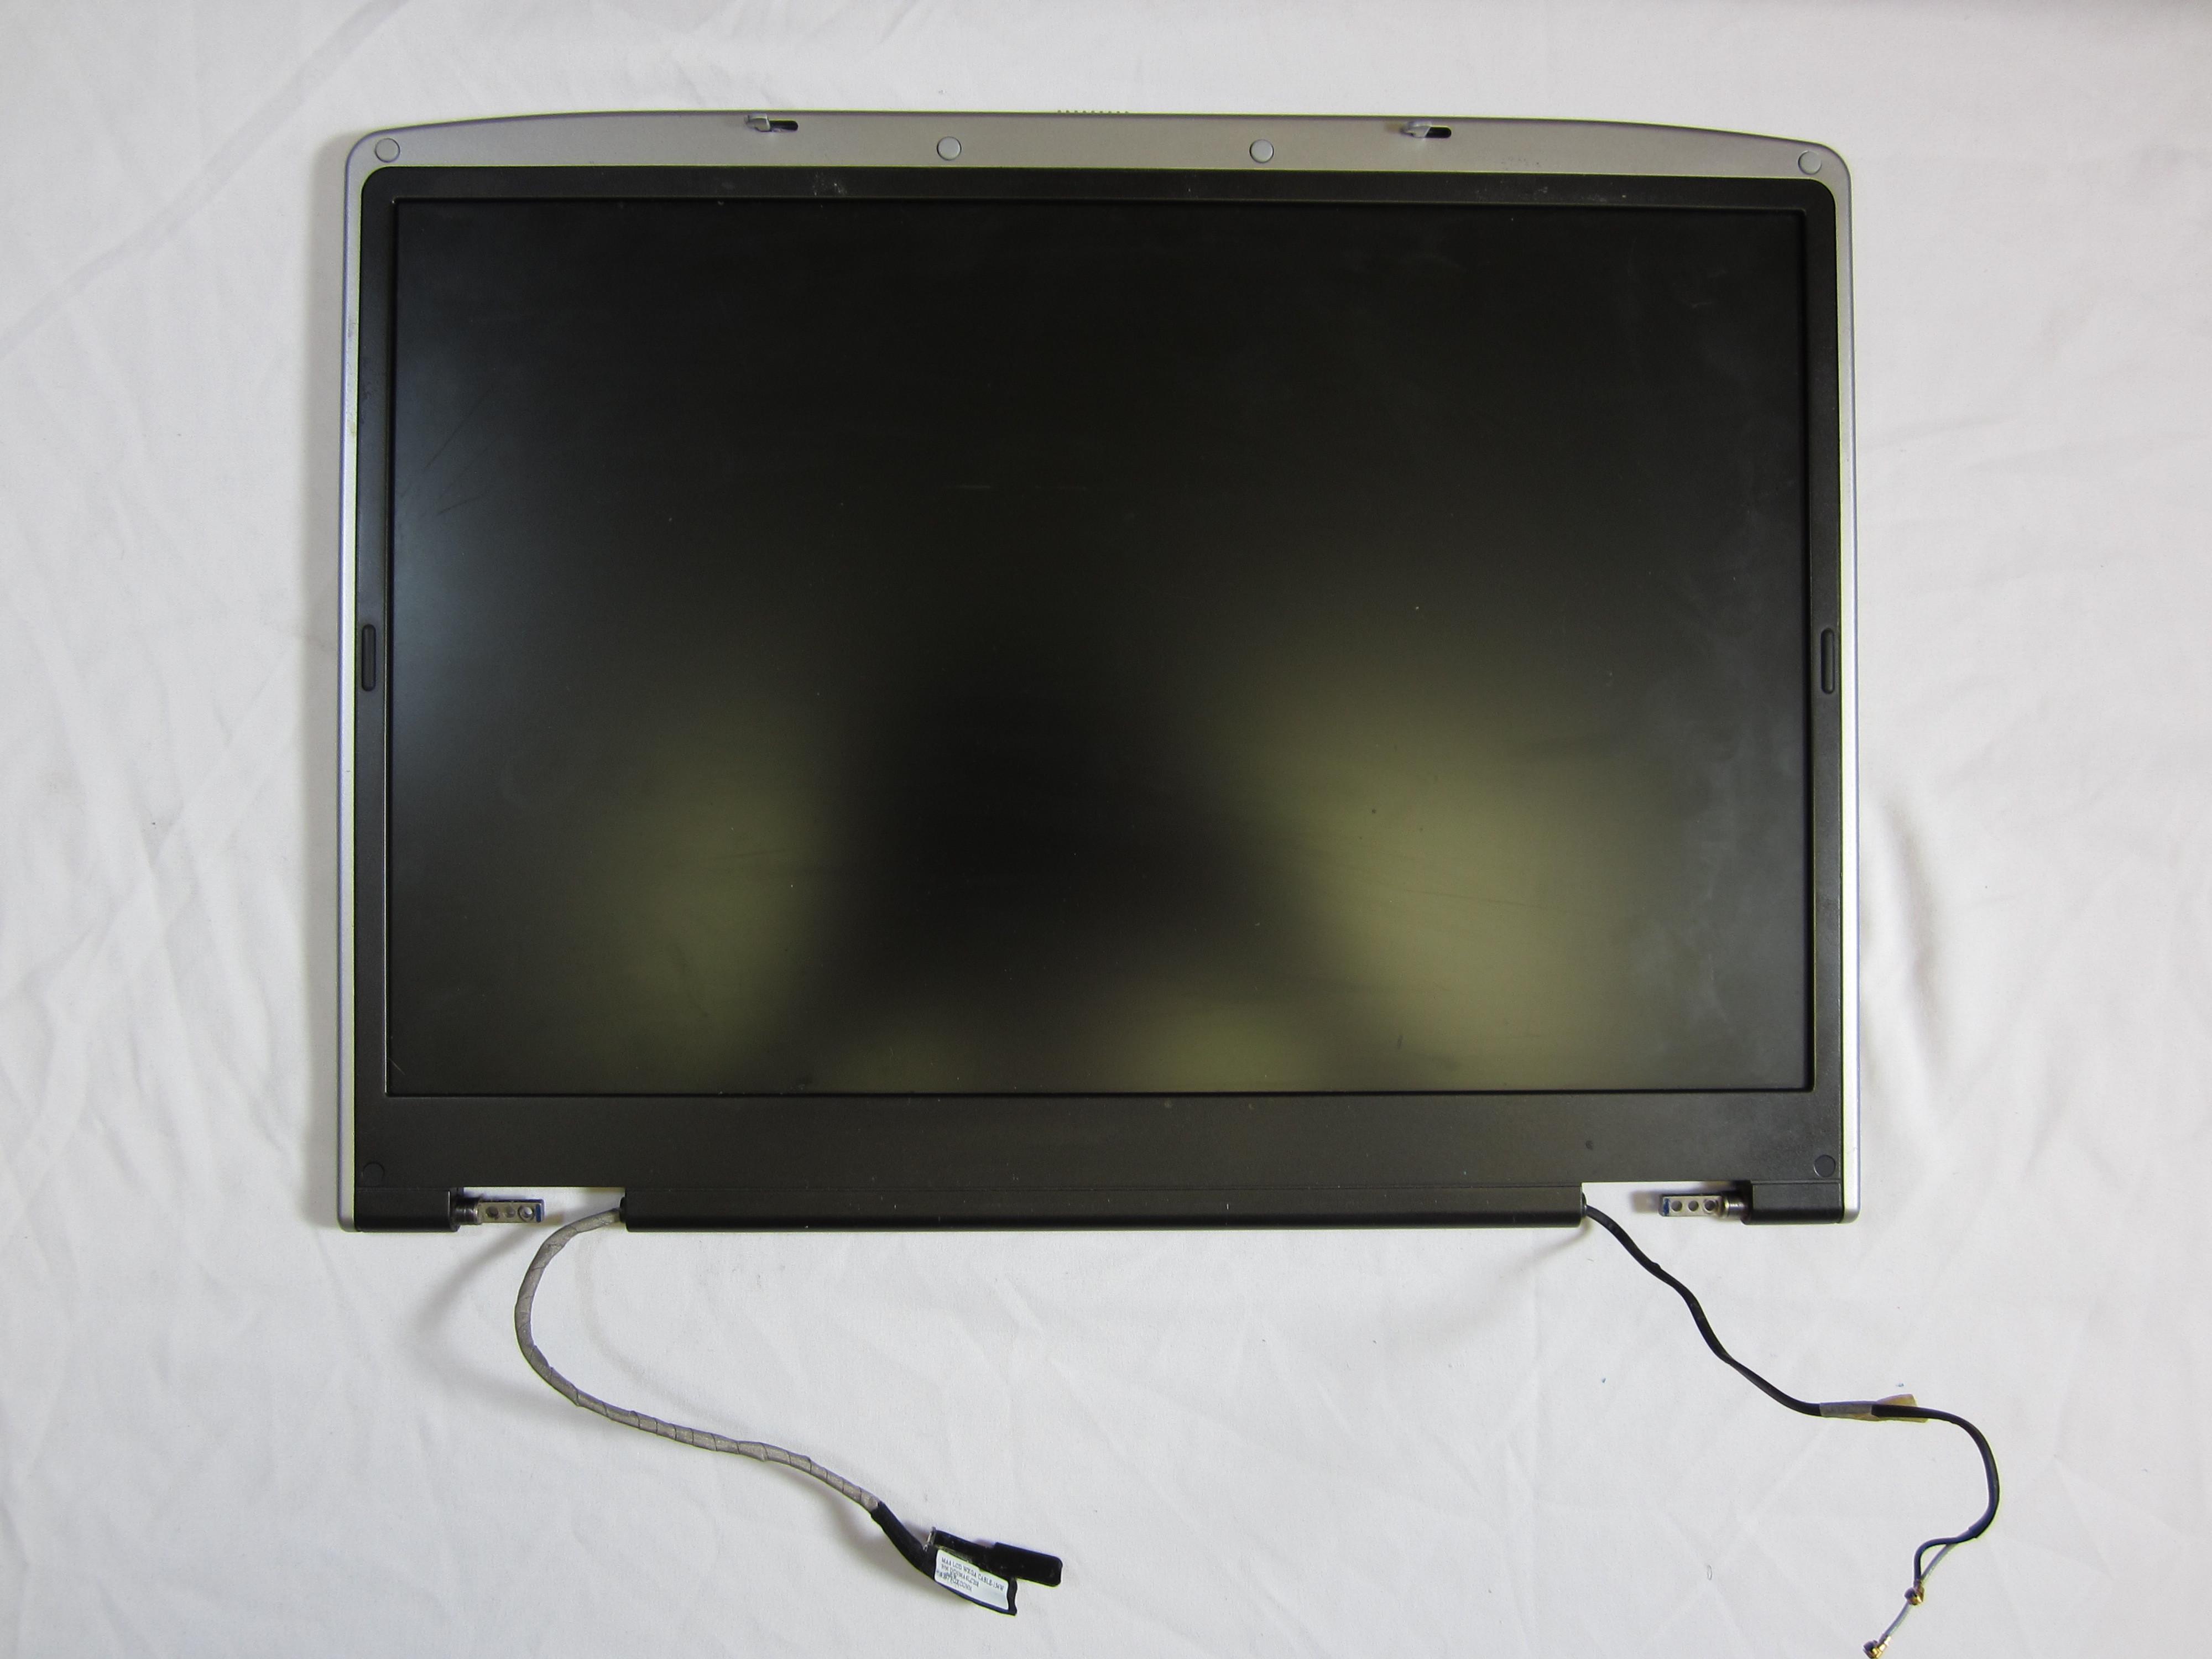 gateway ma6 laptop repair ifixit rh ifixit com Gateway Desktop Computers Gateway Monitor